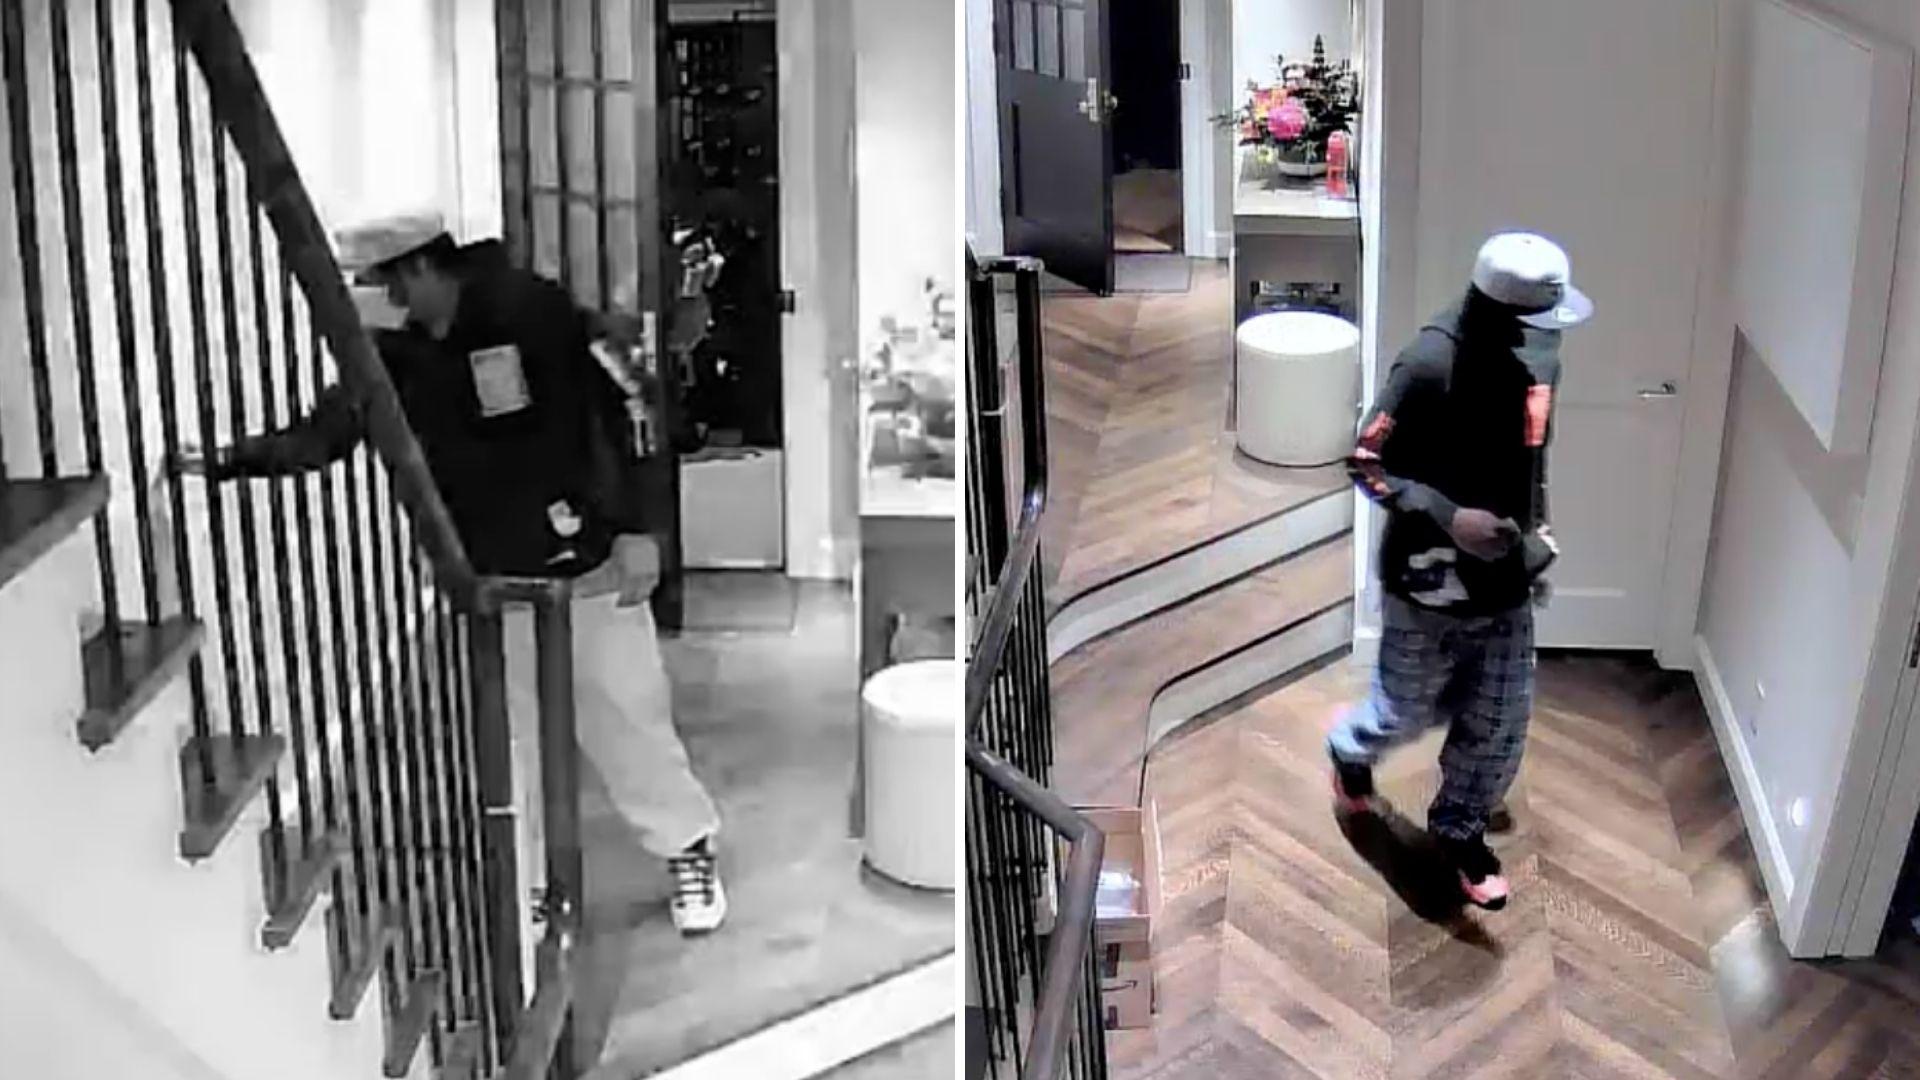 Man breaks into Upper West Side, Manhattan home